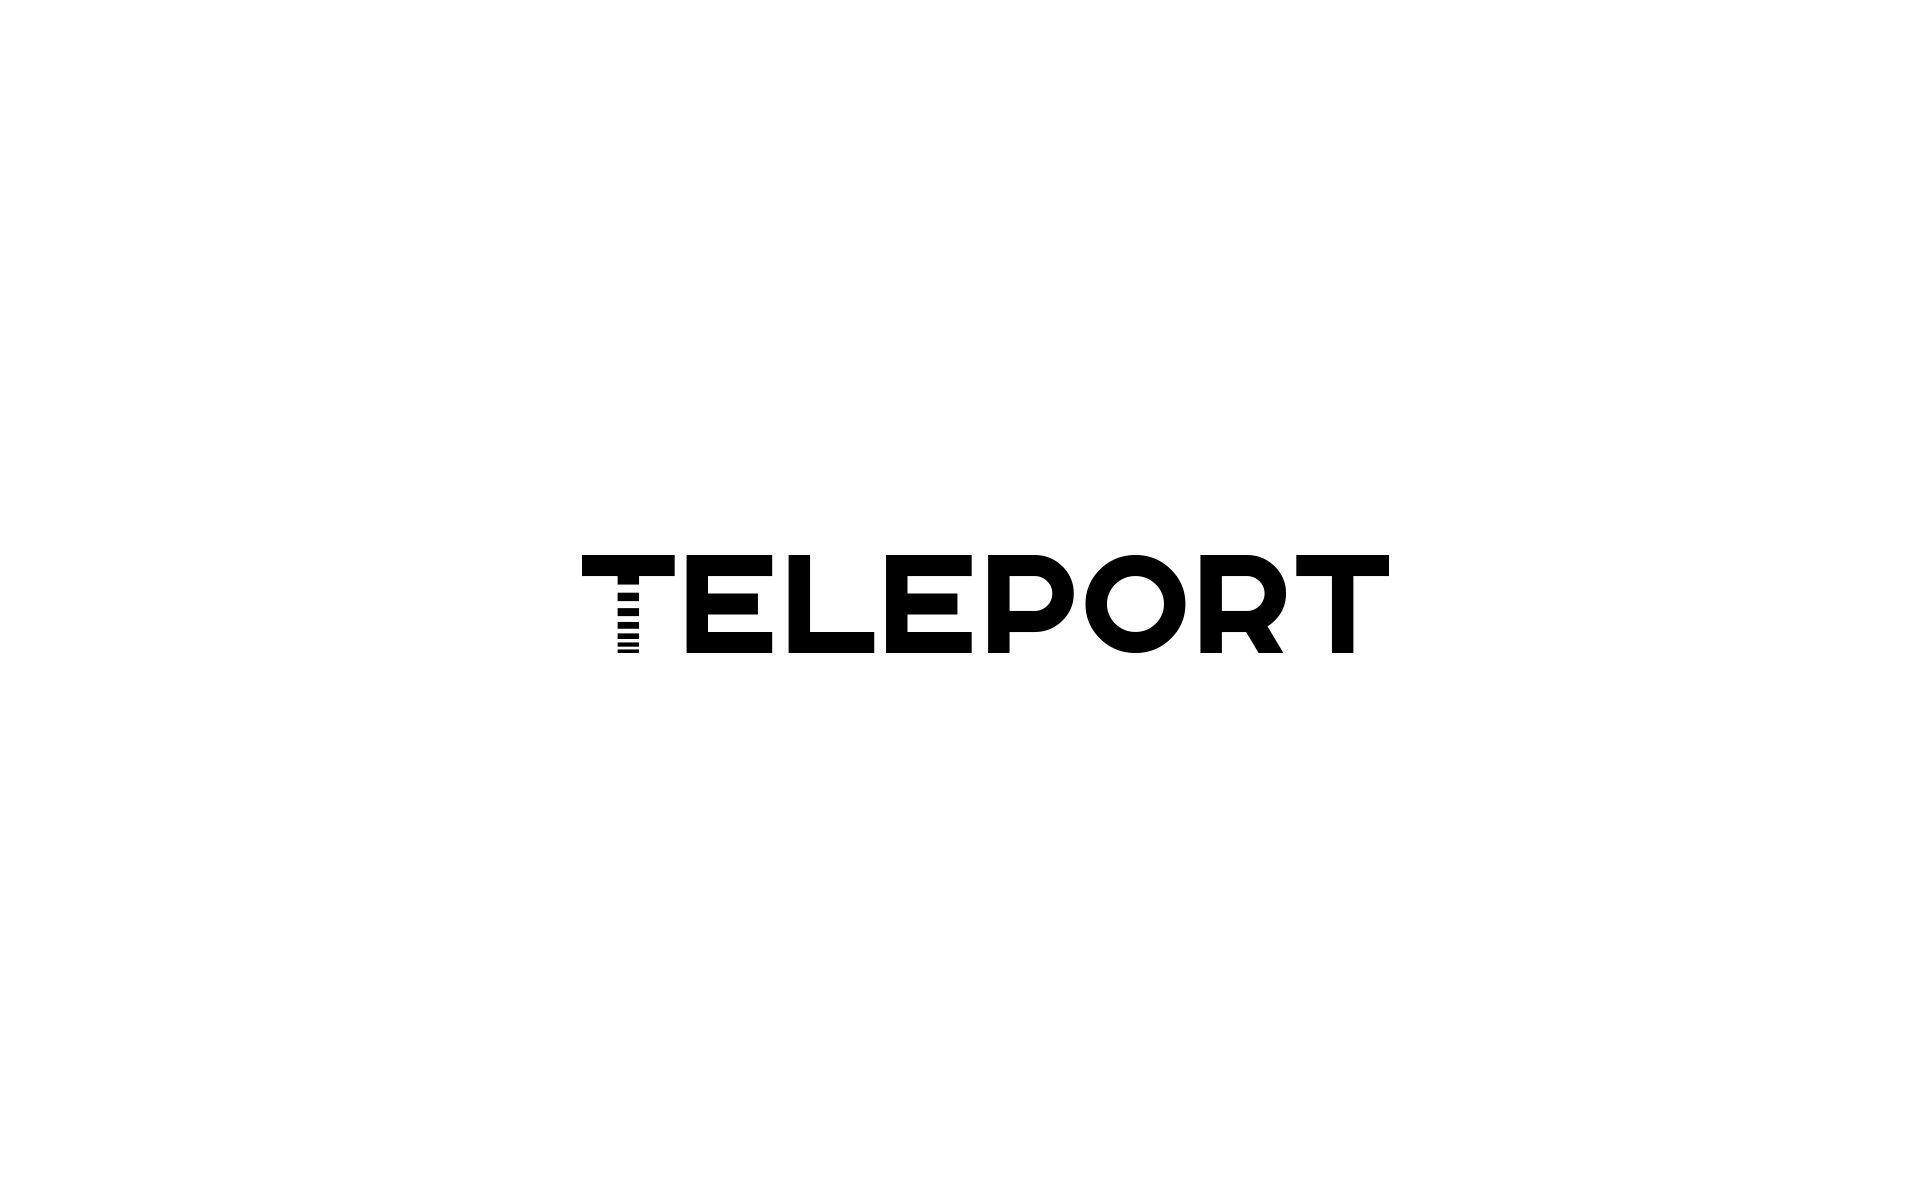 Логотип для Телепорт - дизайнер U4po4mak